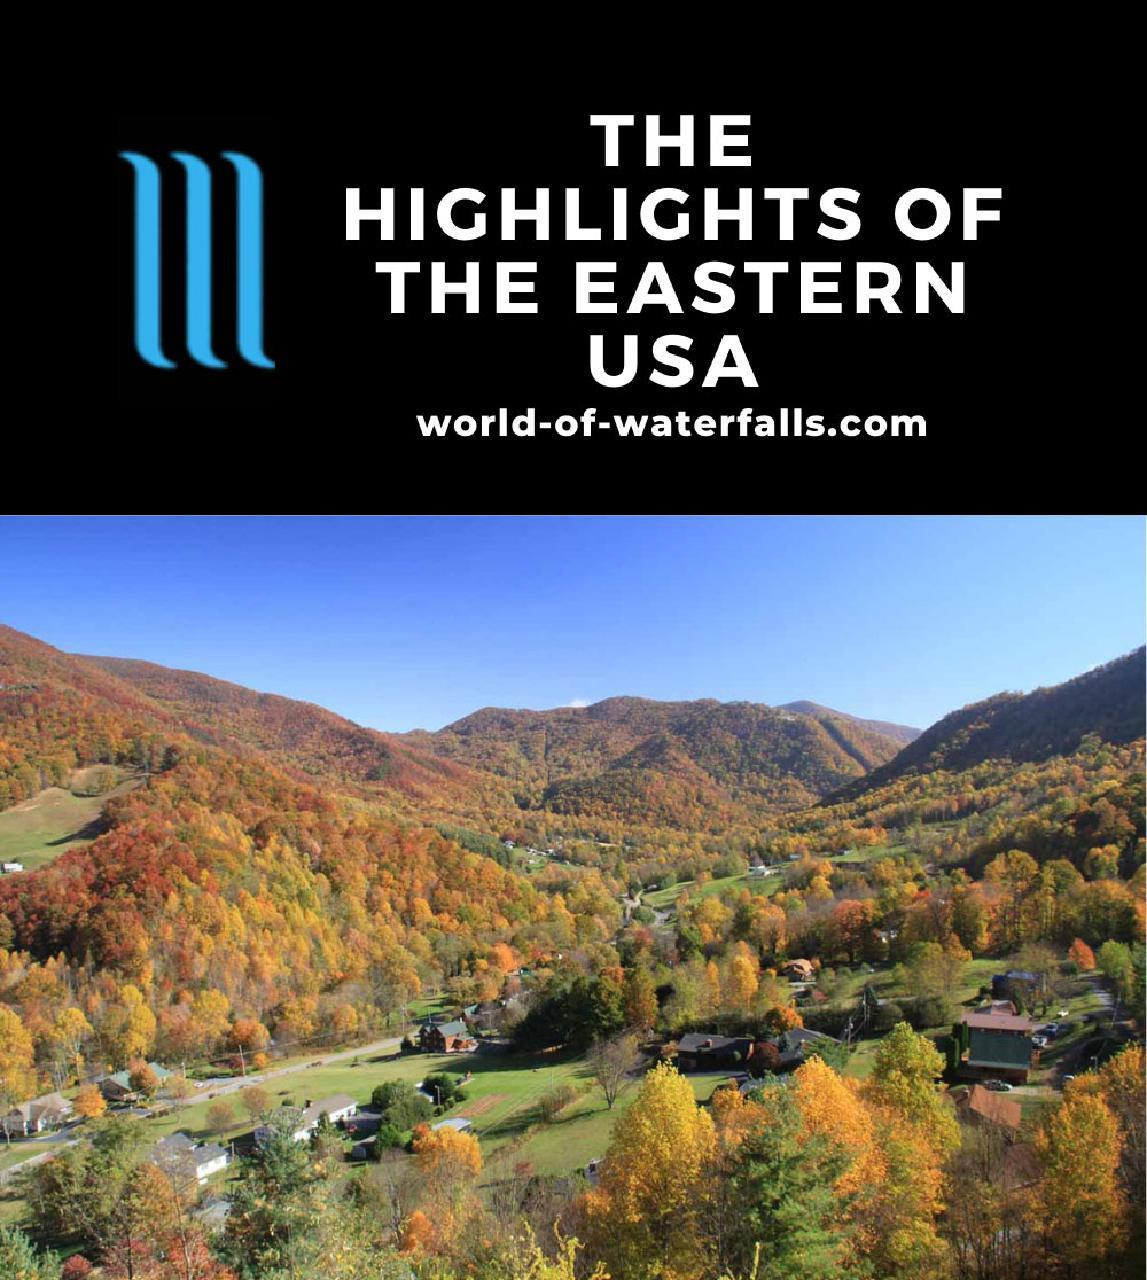 Eastern USA Highlights